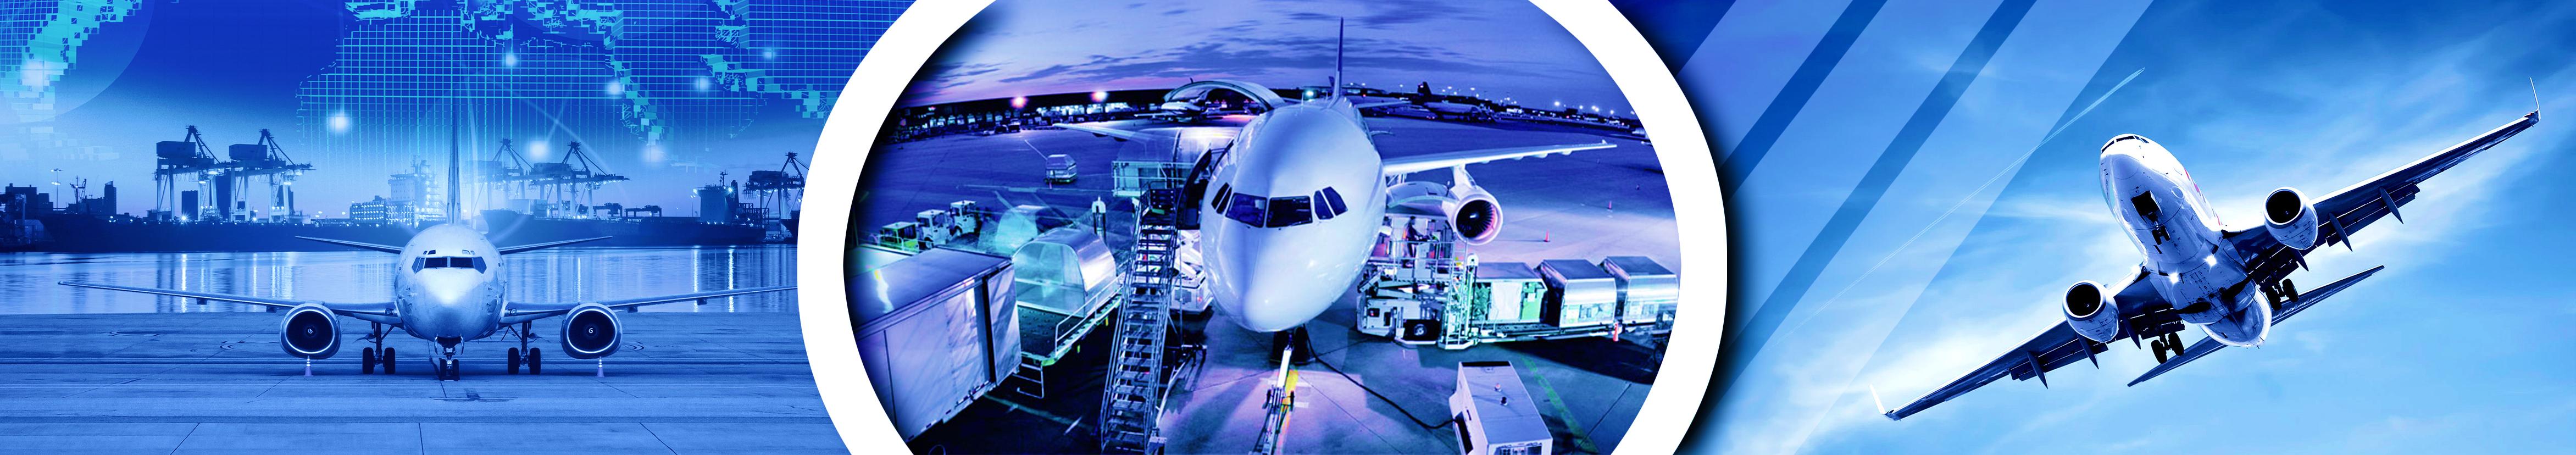 Break Bulk and Air Cargo Services